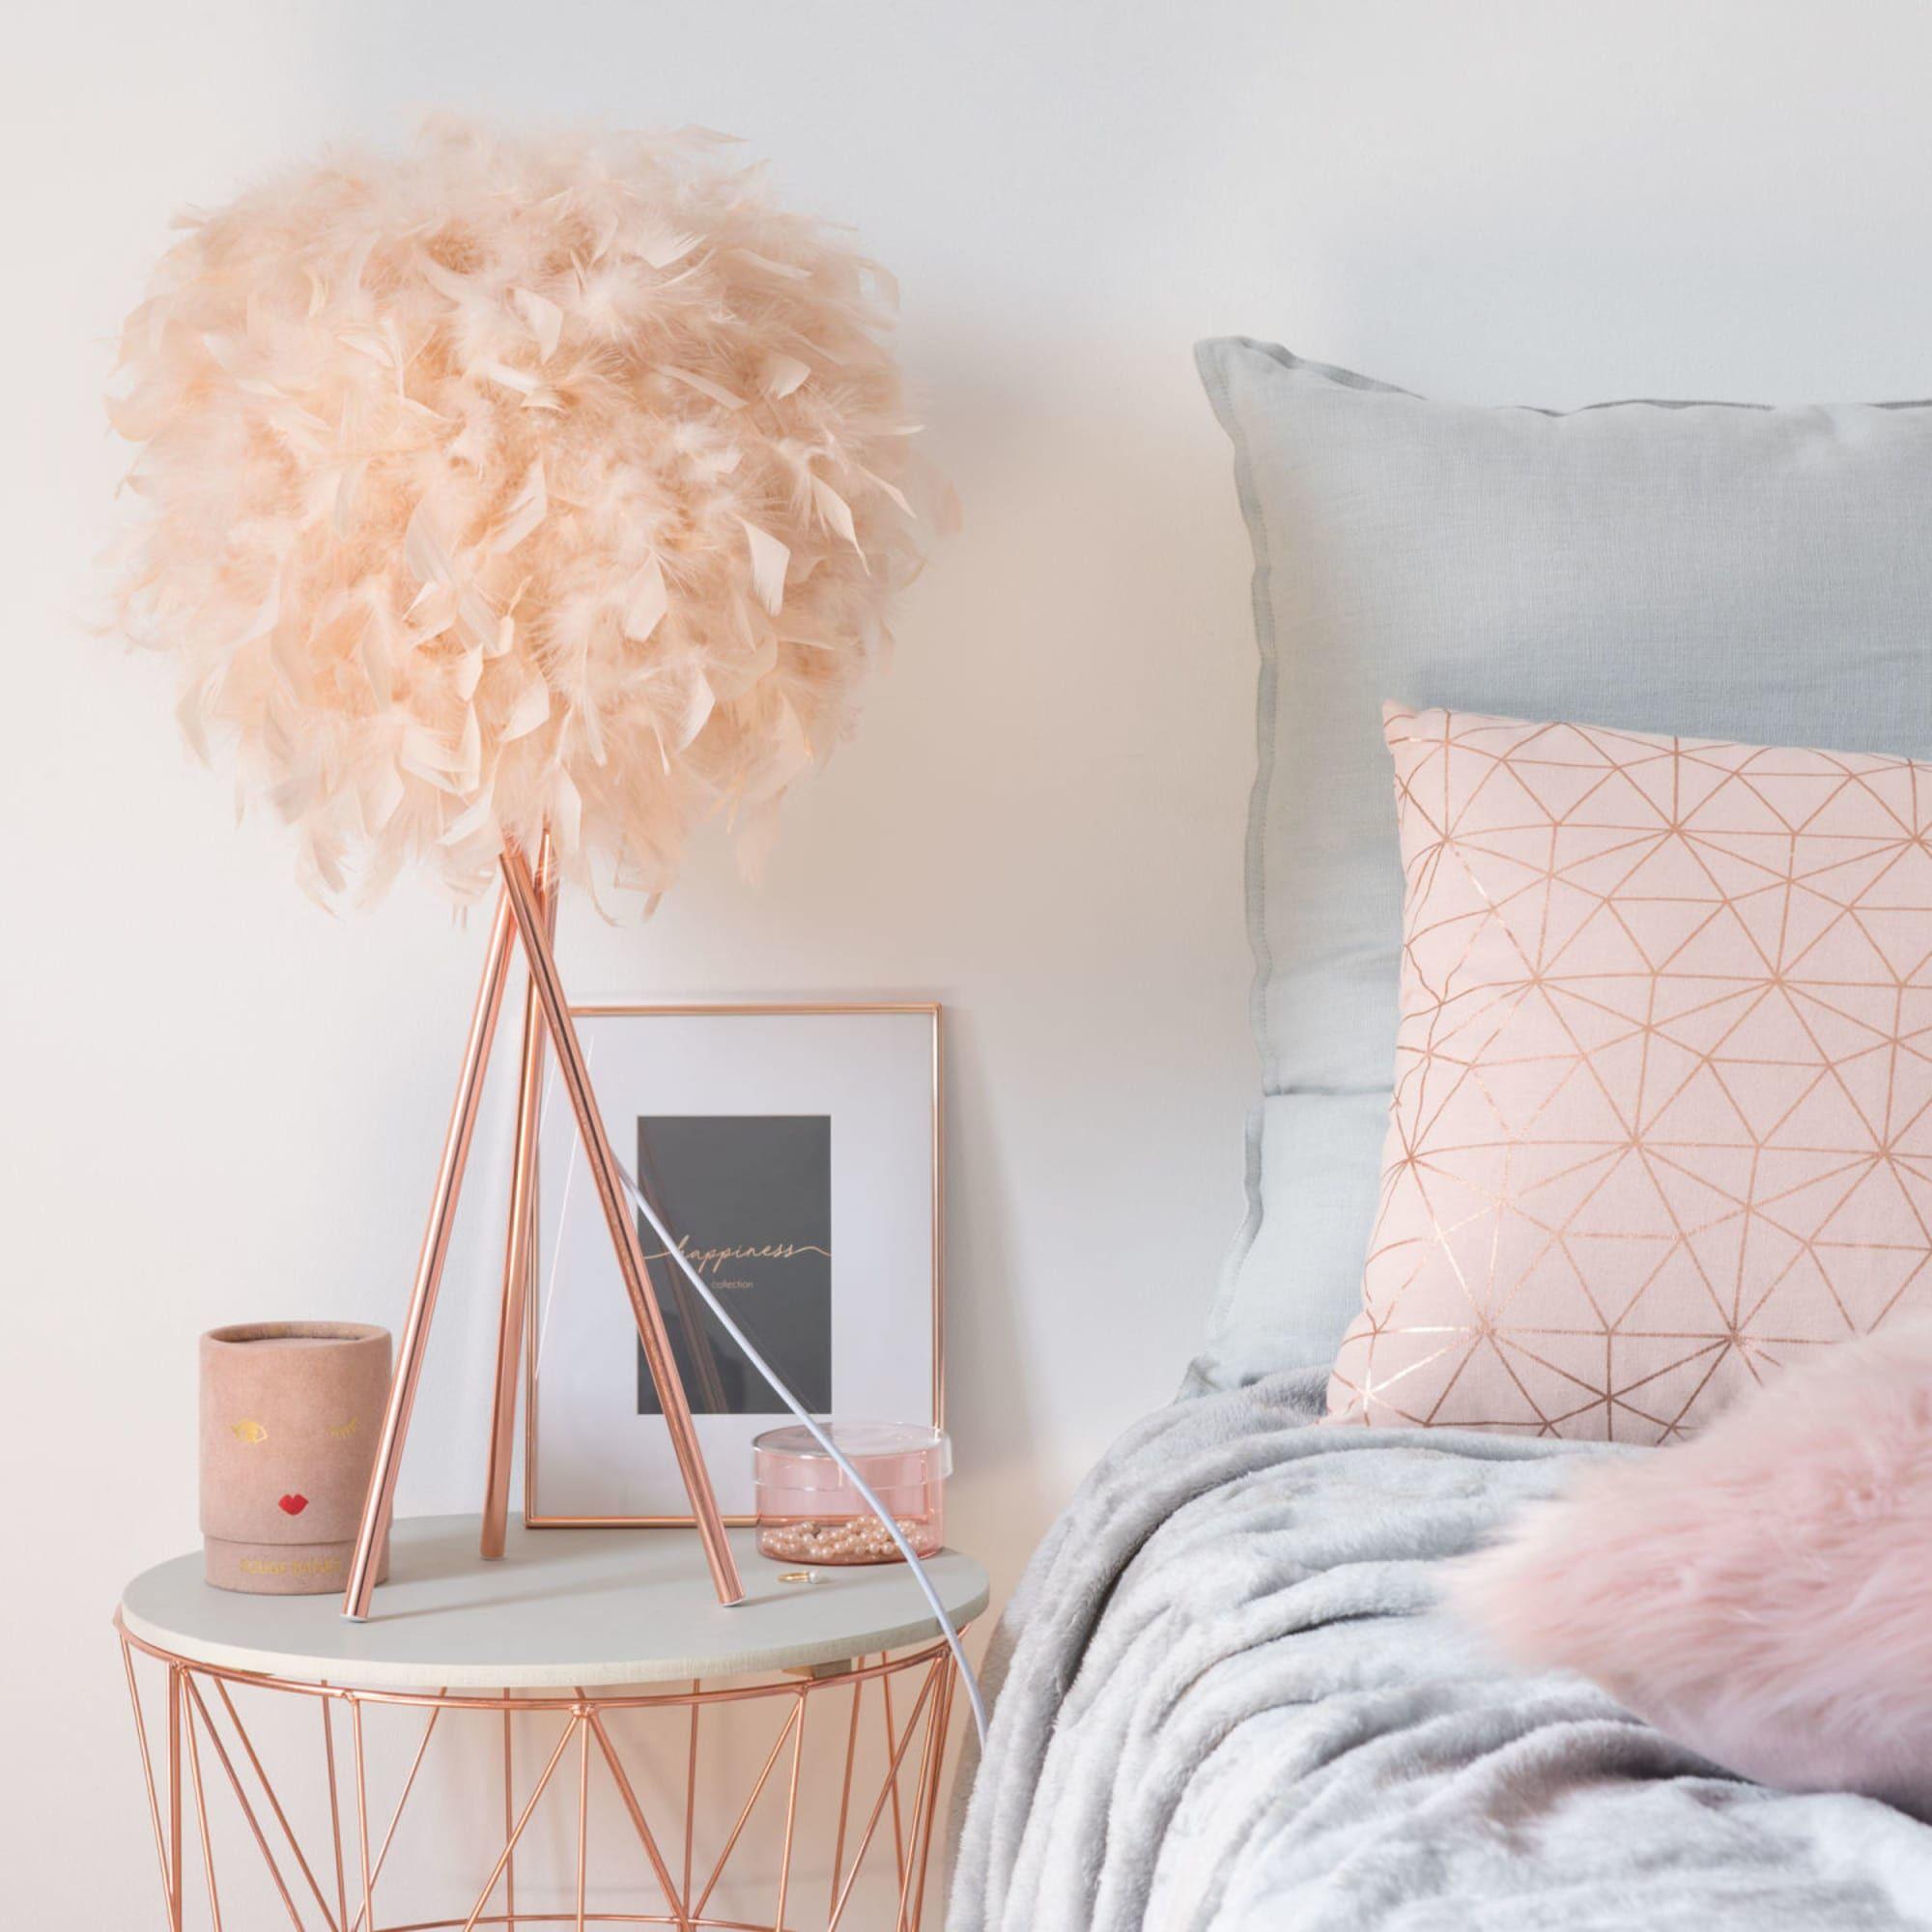 Lampe Aus Metall Lampenschirm Aus Rosa Federn Maisons Du Monde Kid Room Decor Pink Home Accessories Home Decor Bedding